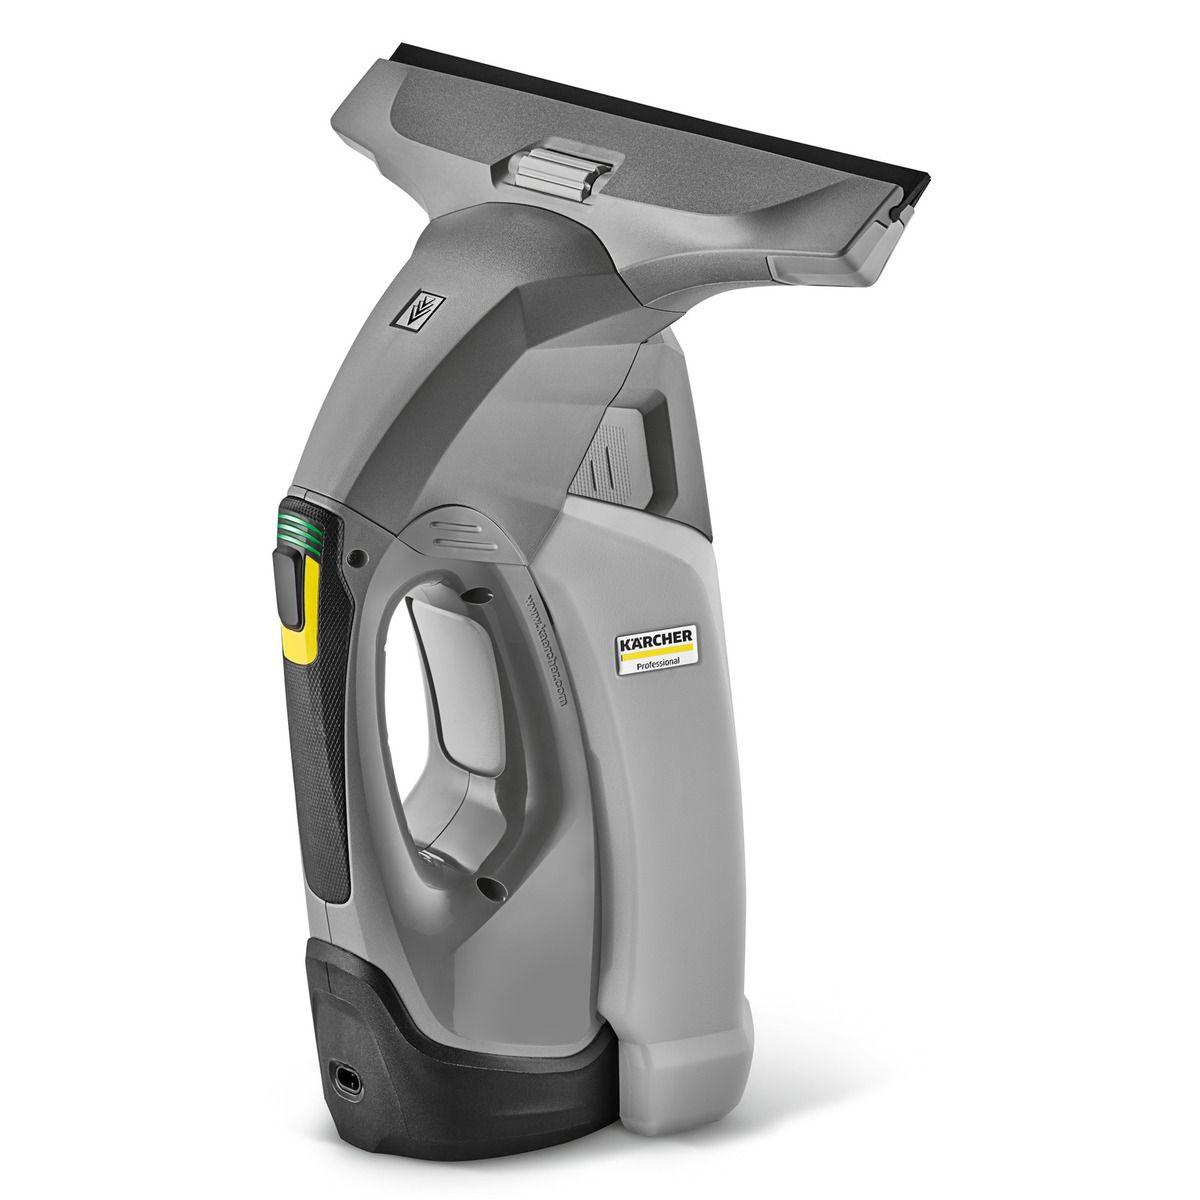 Wvp 10 Adv Karcher International Vacuum Cleaner Pen Design 10 Things